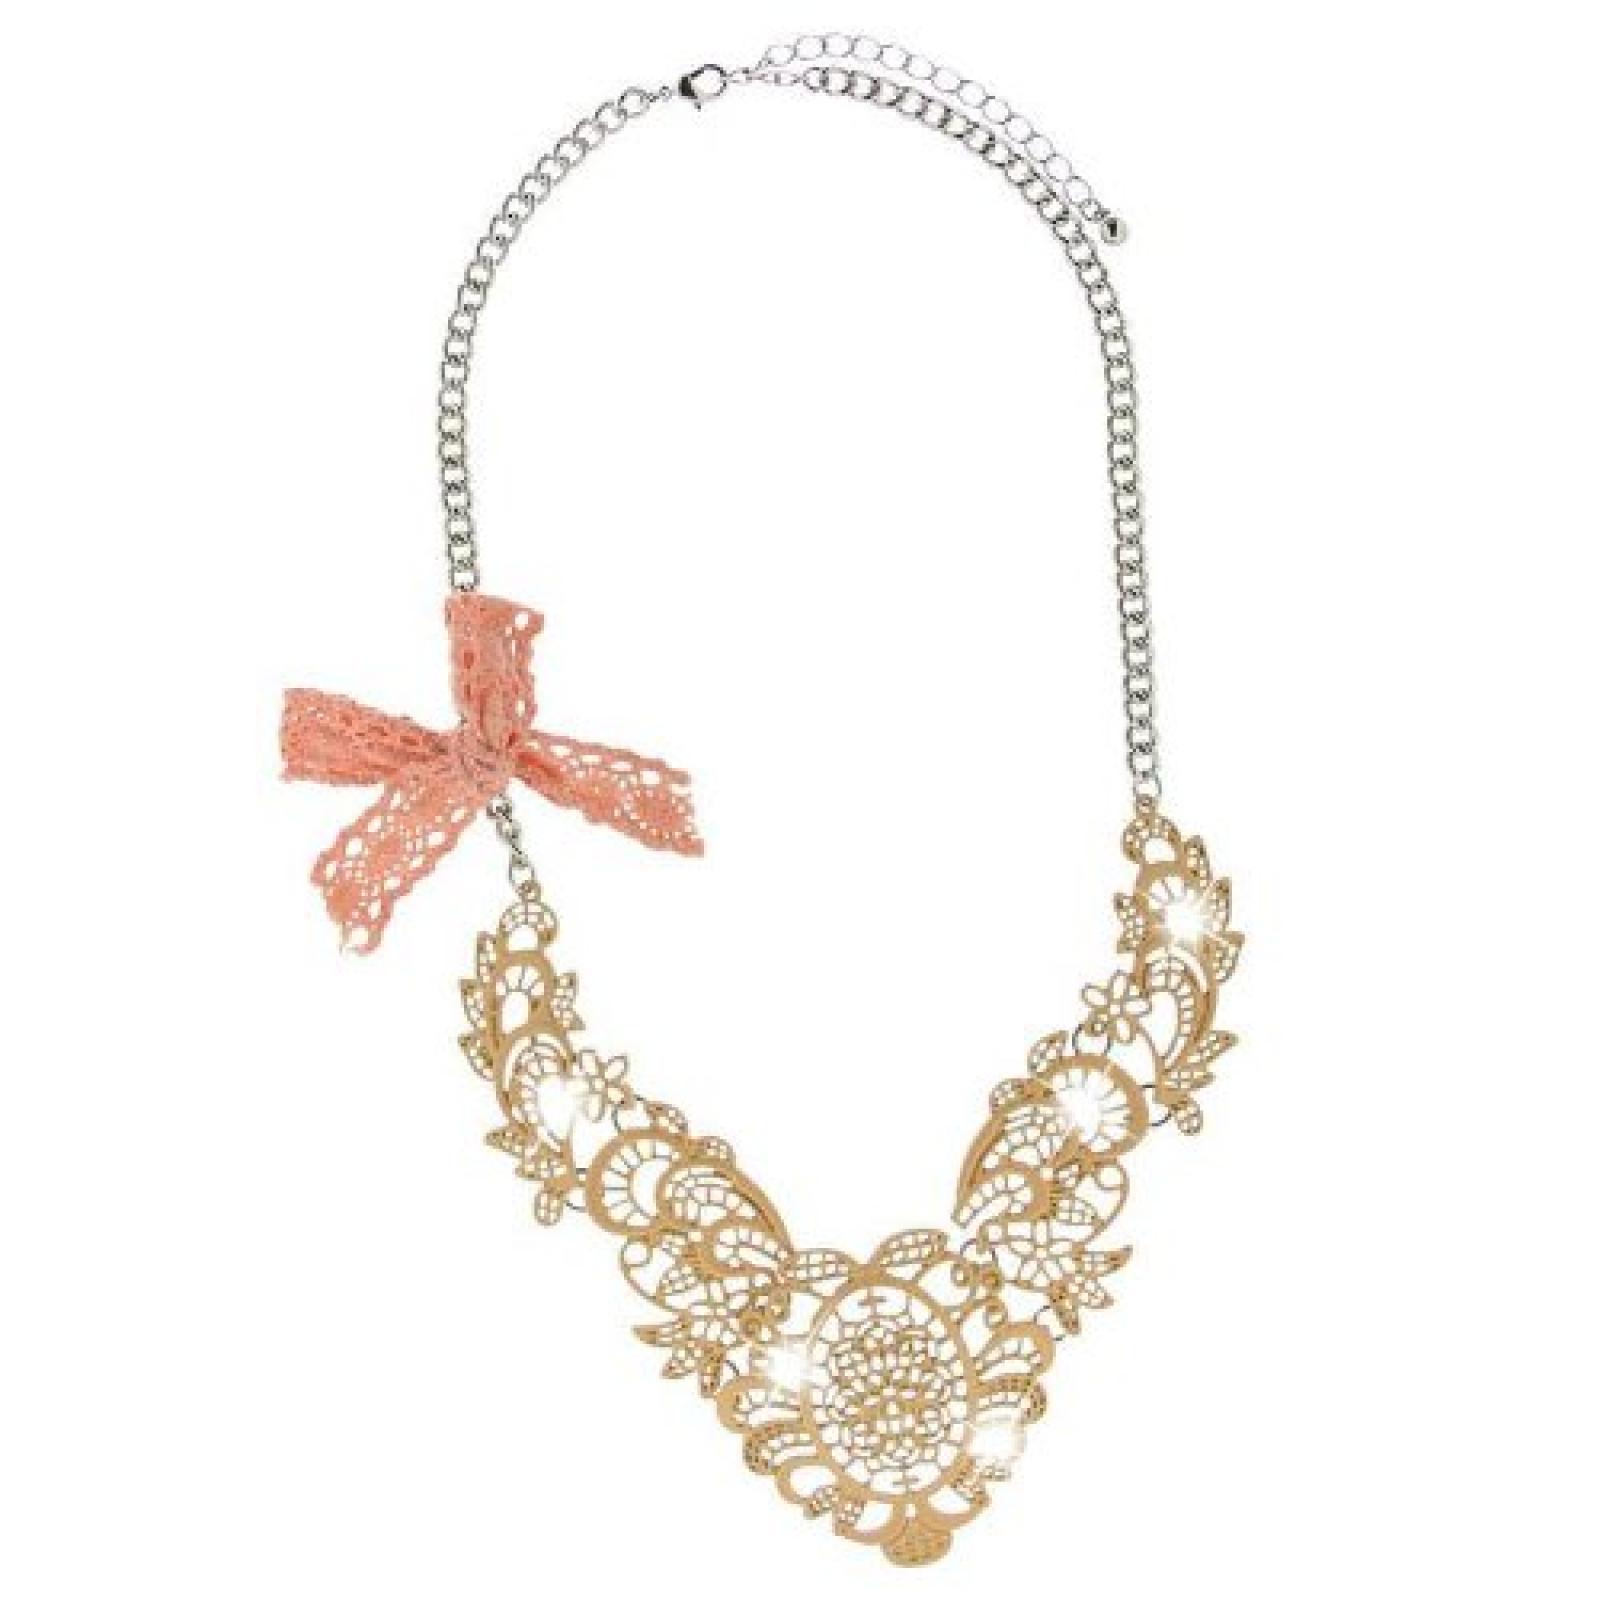 Sweet Deluxe Damen Halskette Metall rhodiniert Kunststoff 45 cm silber/beige 2966